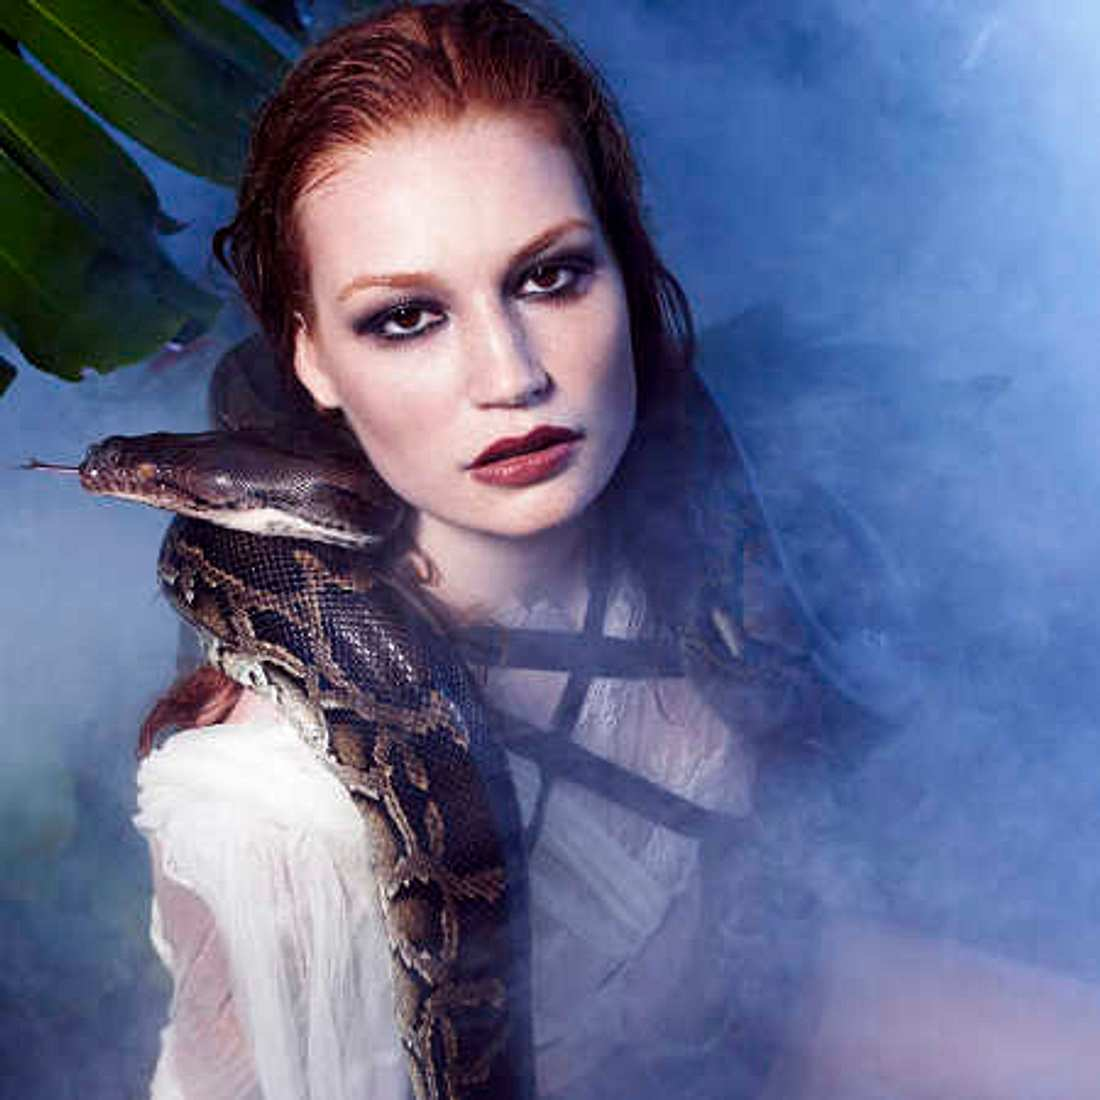 Model Jana beim Schlangenshooting